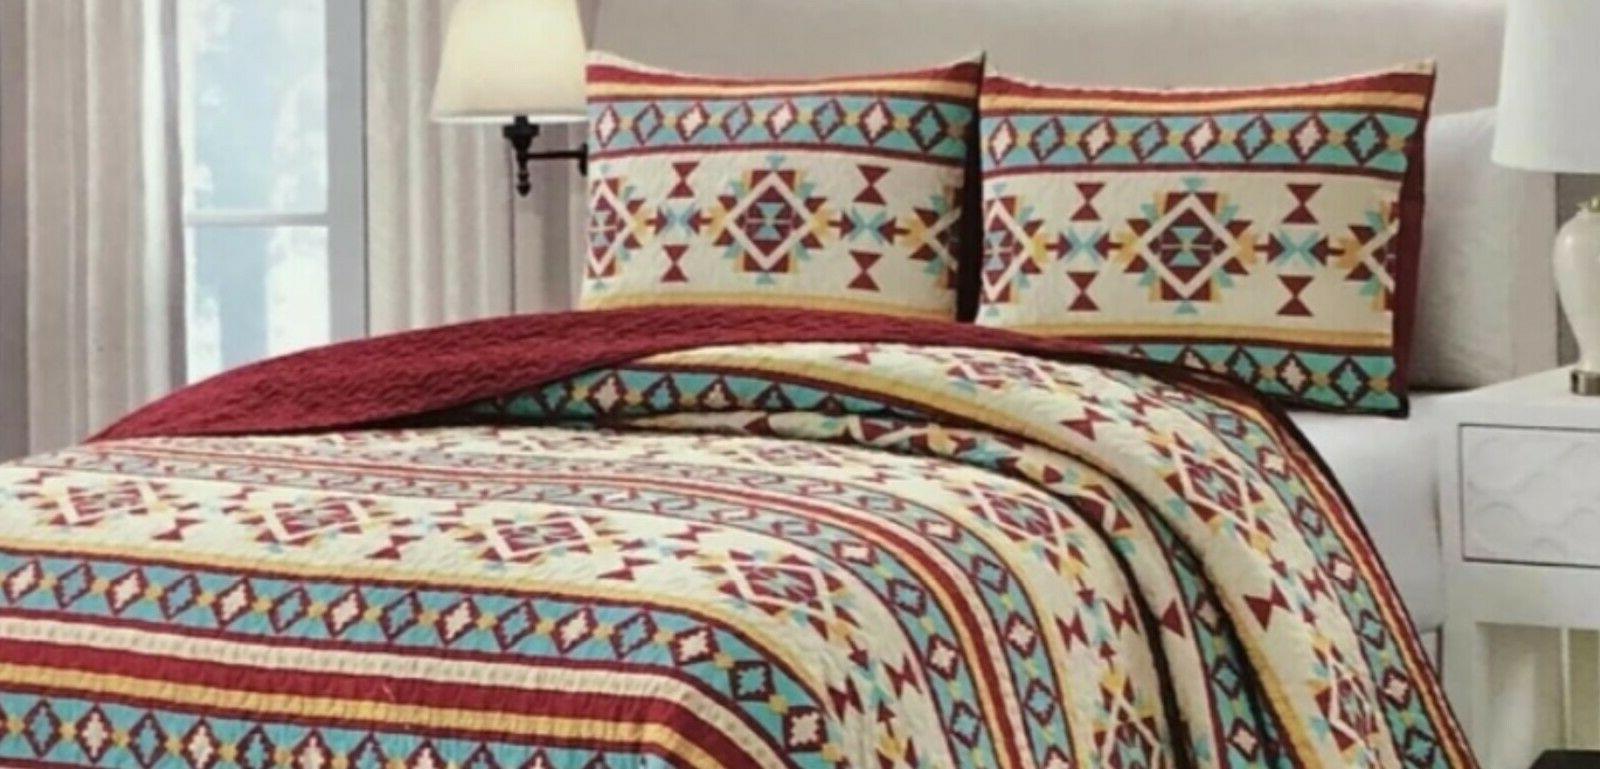 Quilt 3, Reversible Southwest Bedspread Gift